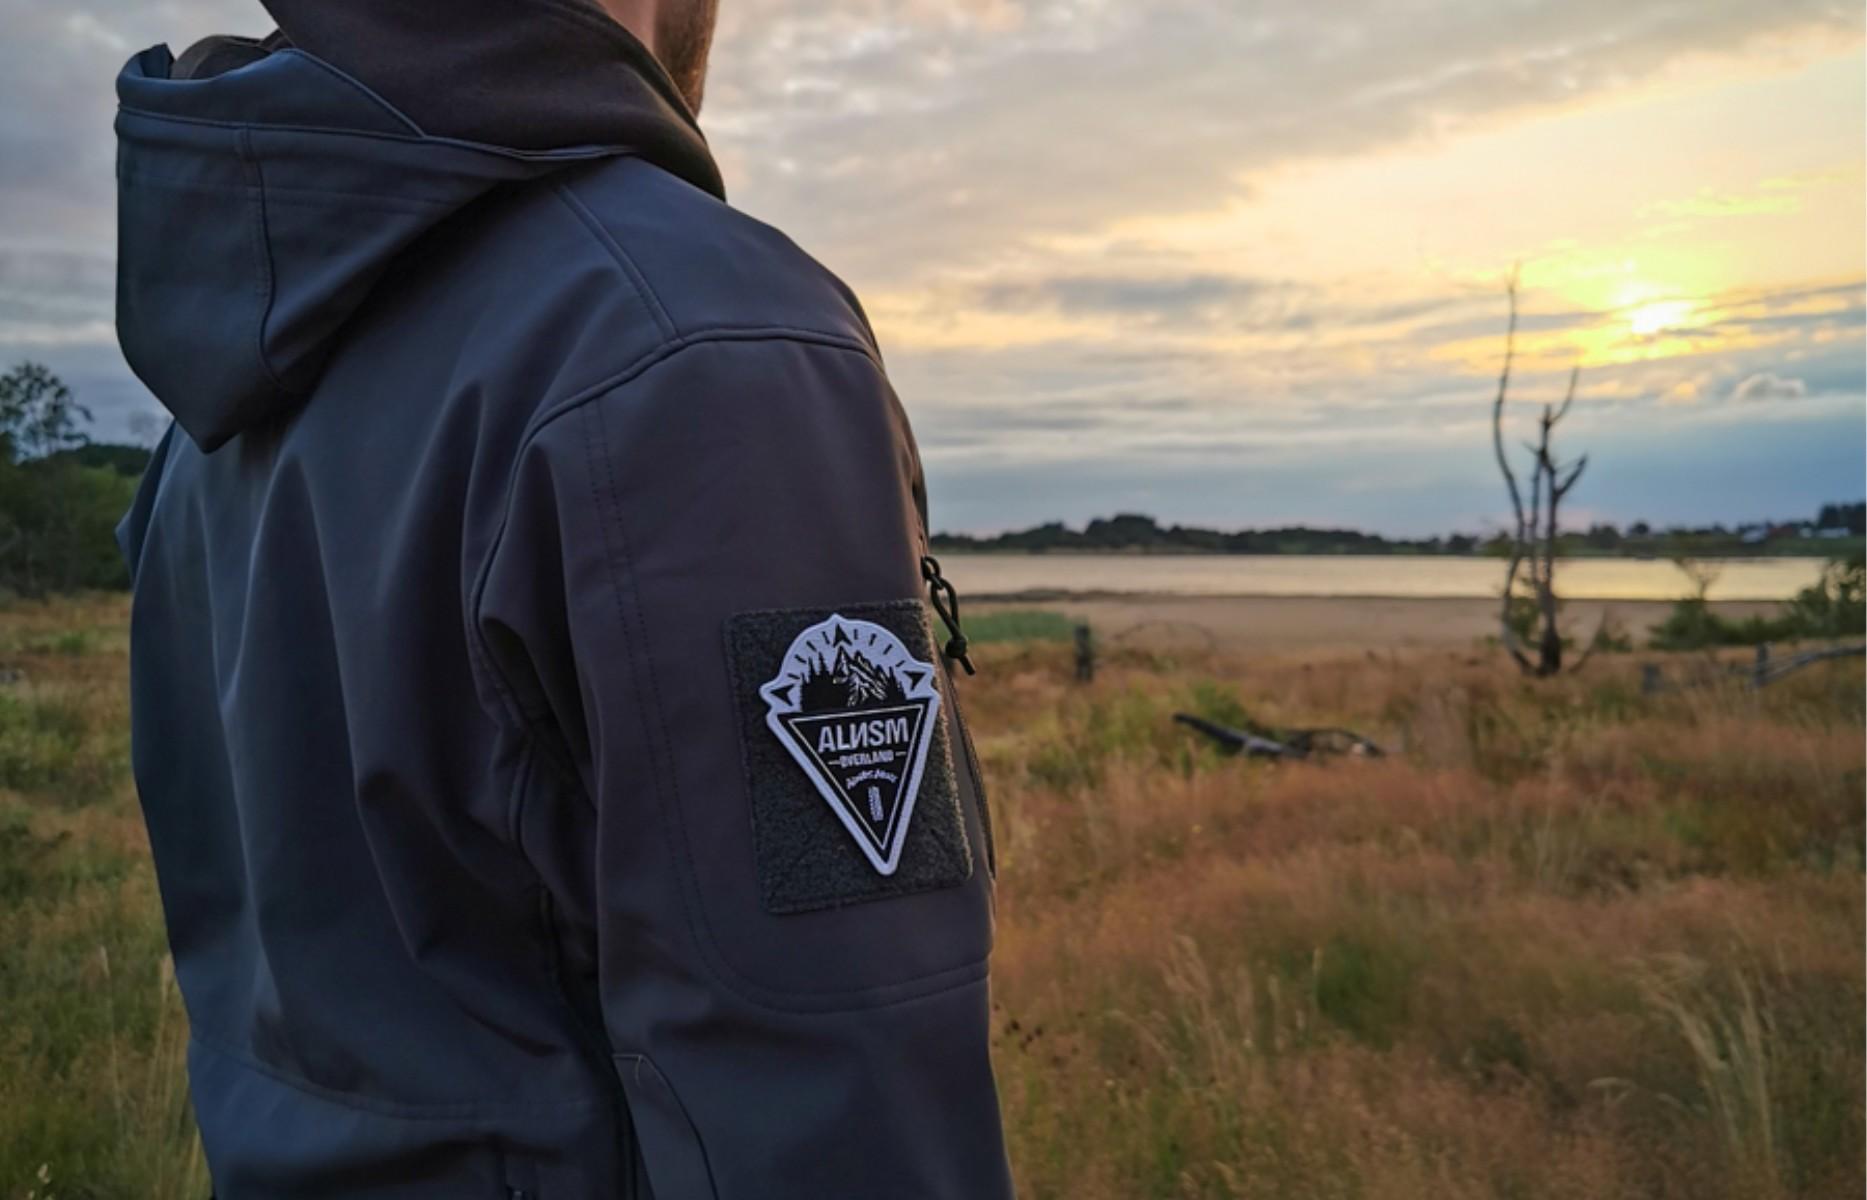 patch on tactical vest